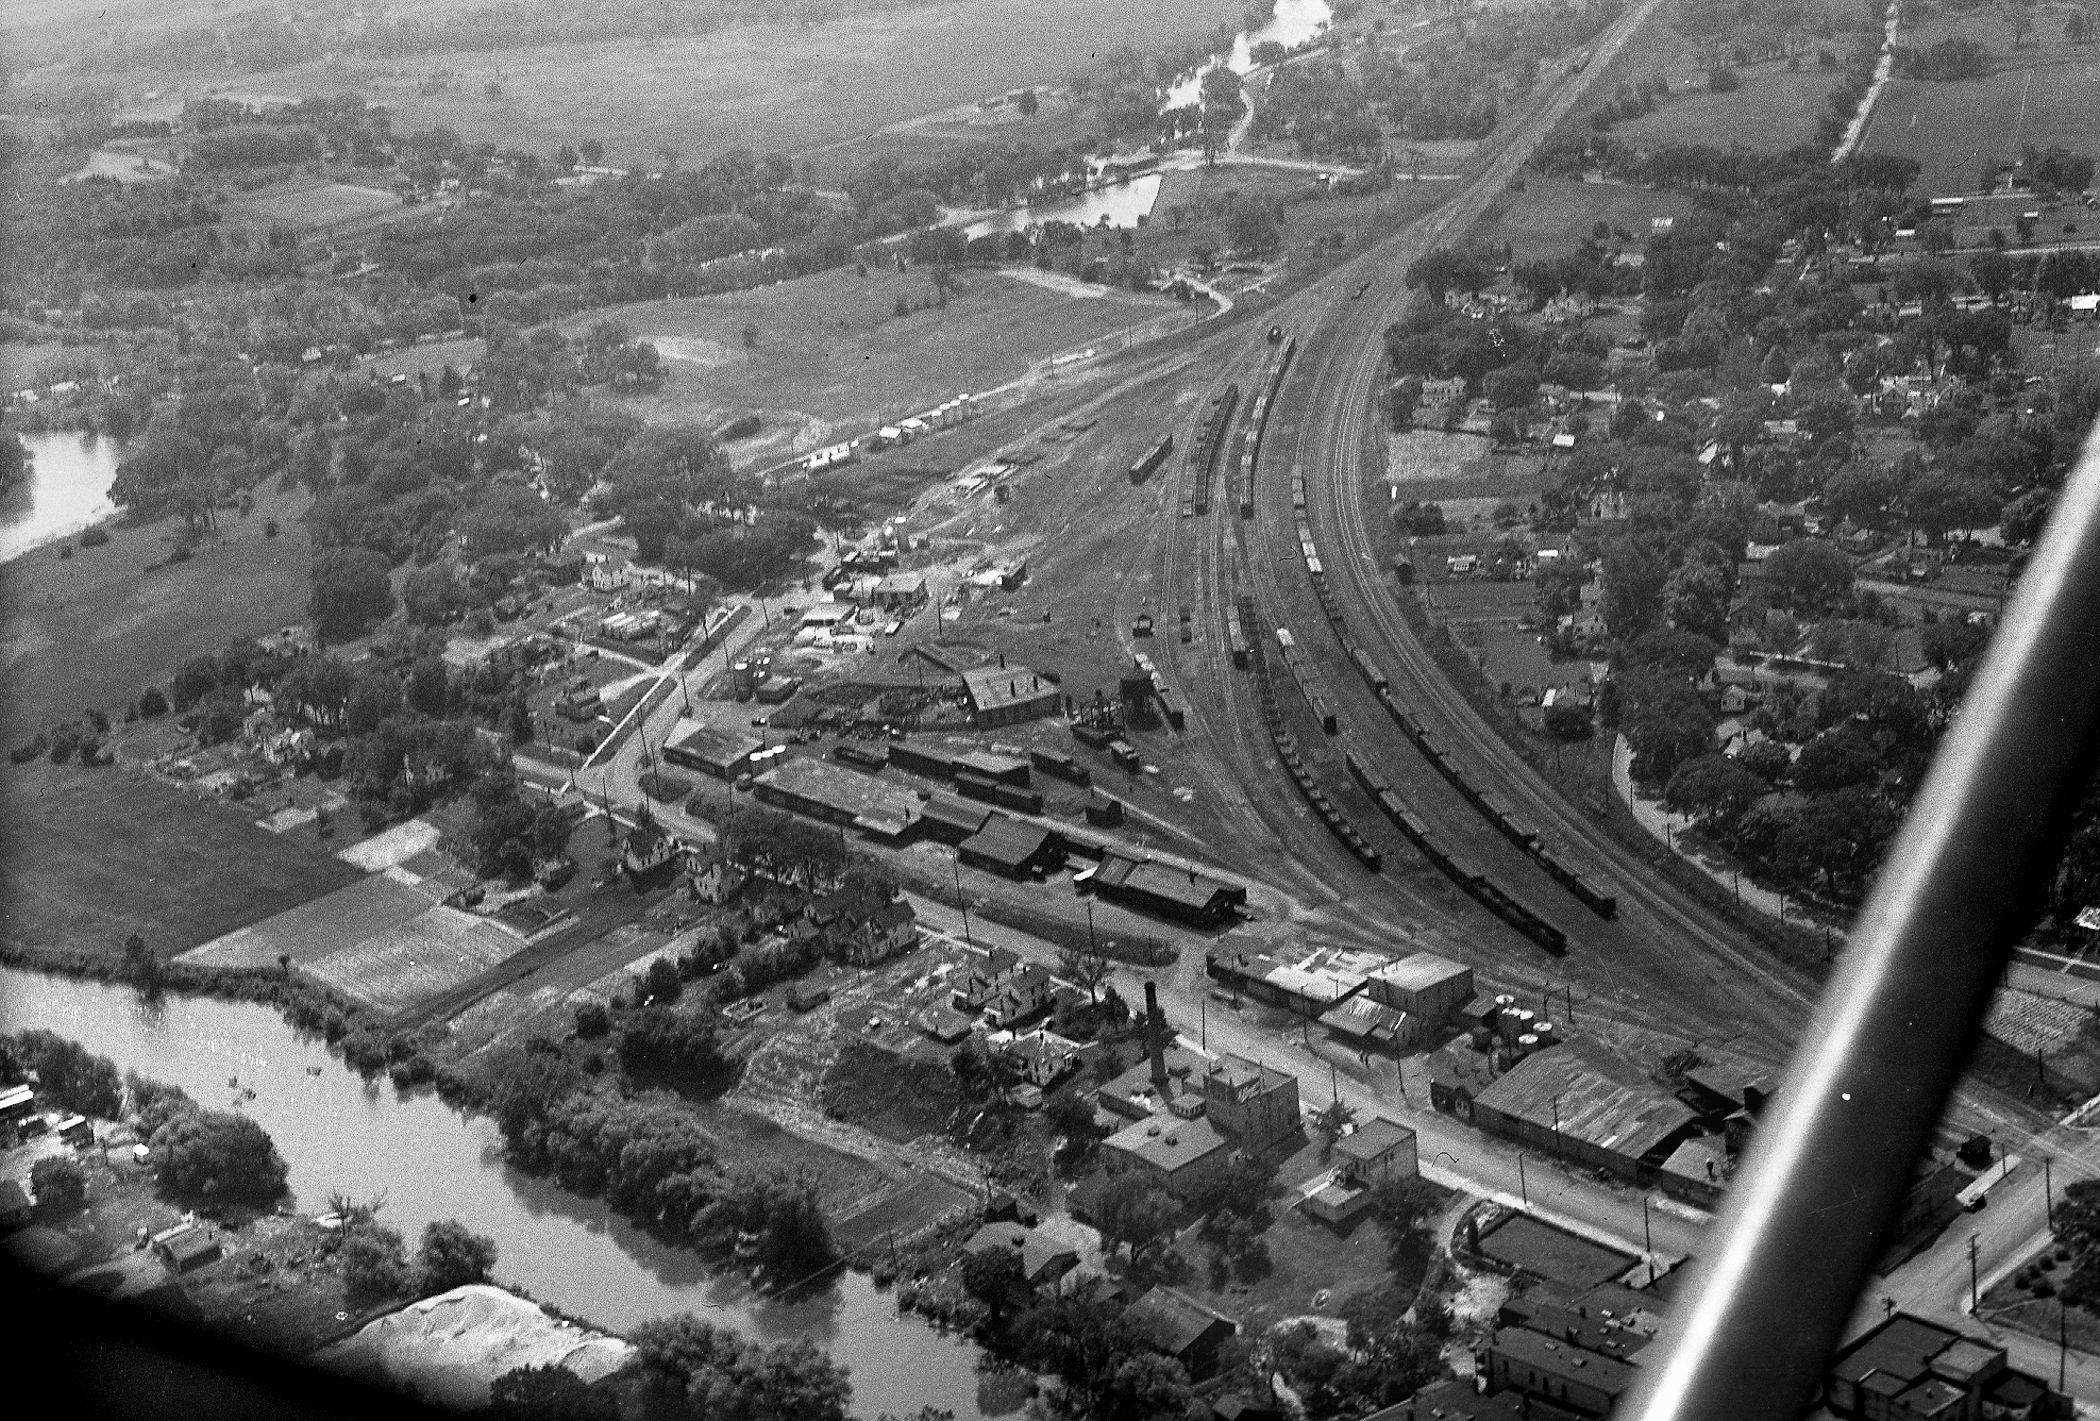 Ron Rich/SCHS Photo ca. 1945 - Railroad Yard